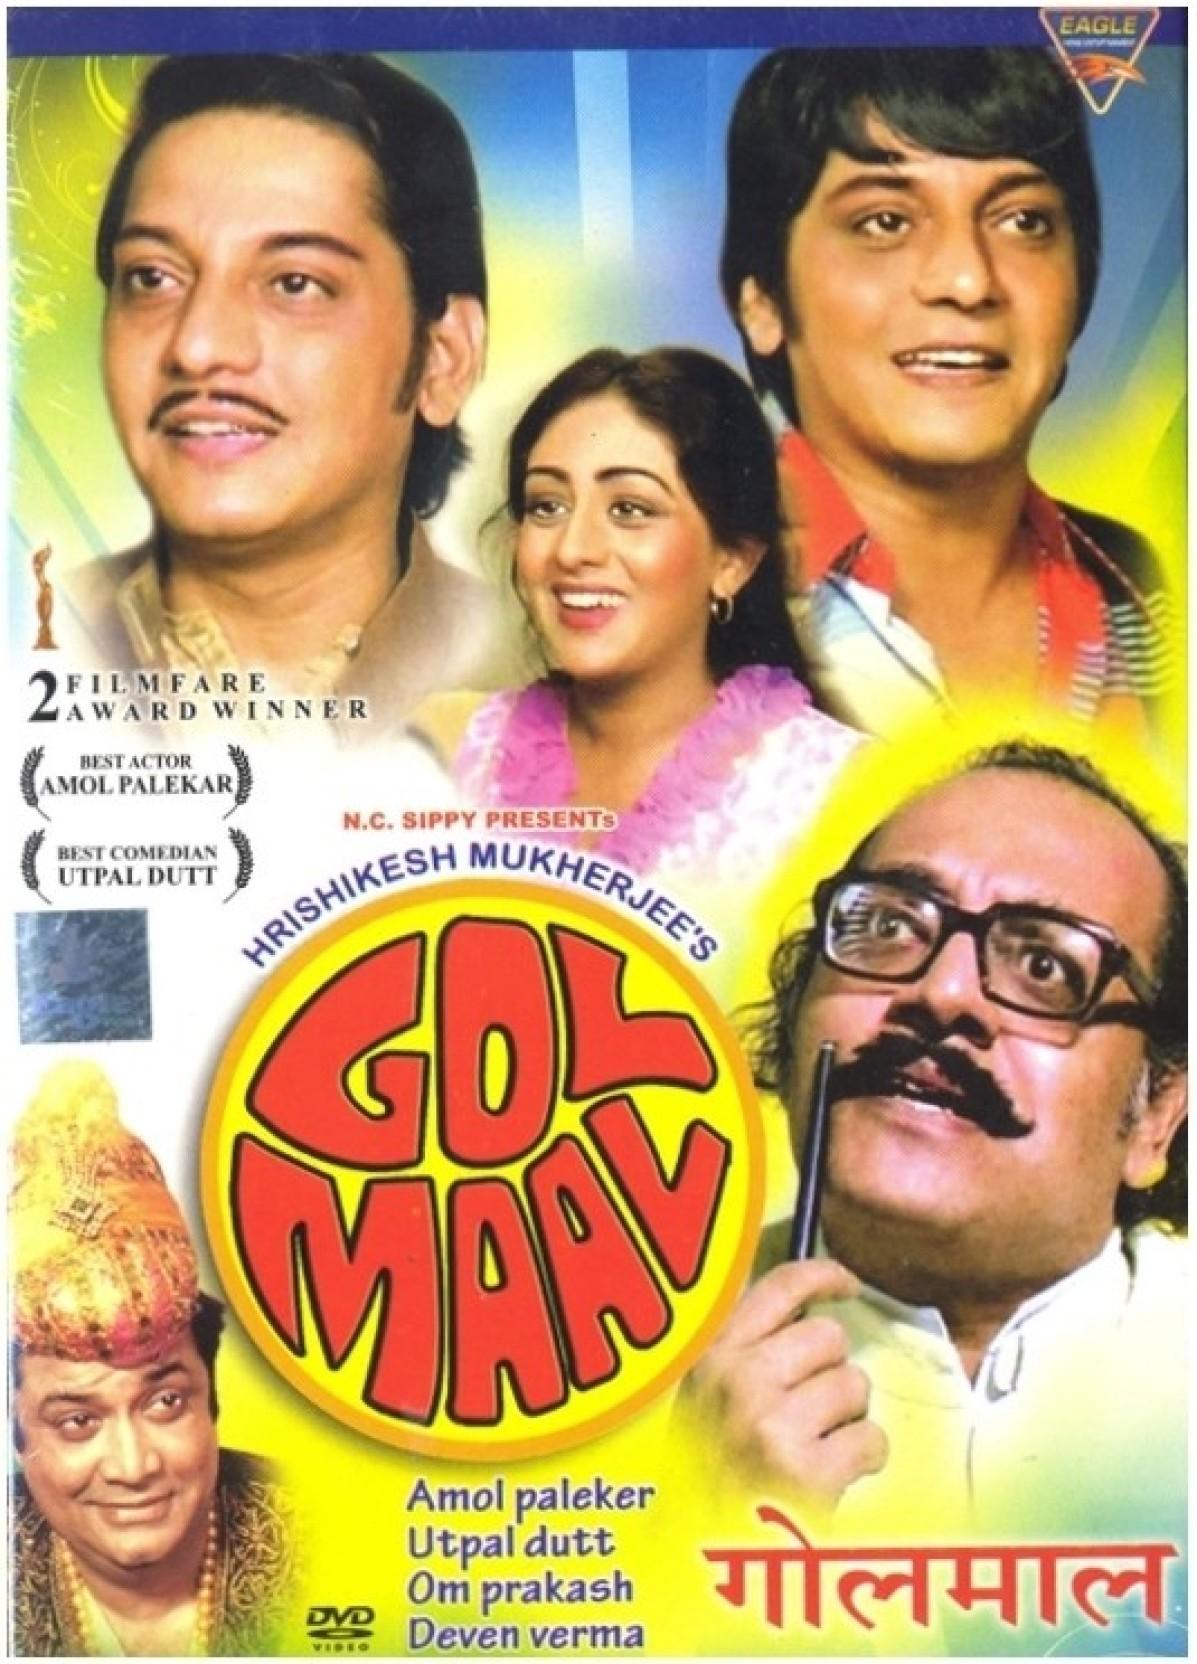 Watch Golmaal 3 Full Movie Hindi Online Free